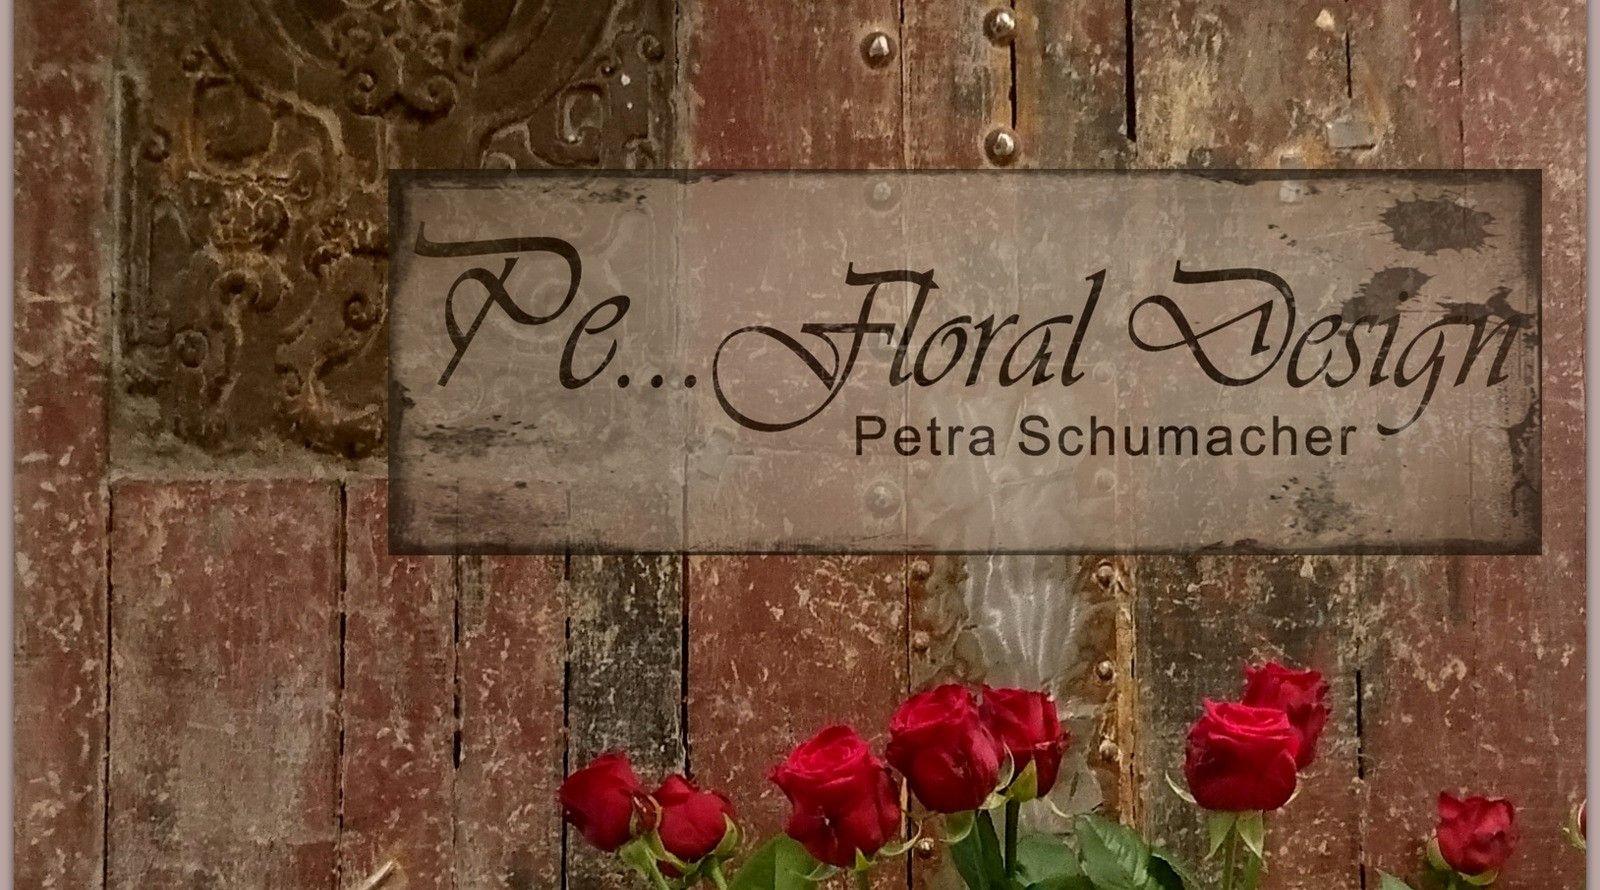 Blumen Pe...FloralDesign | ISG Solingen-Ohligs e